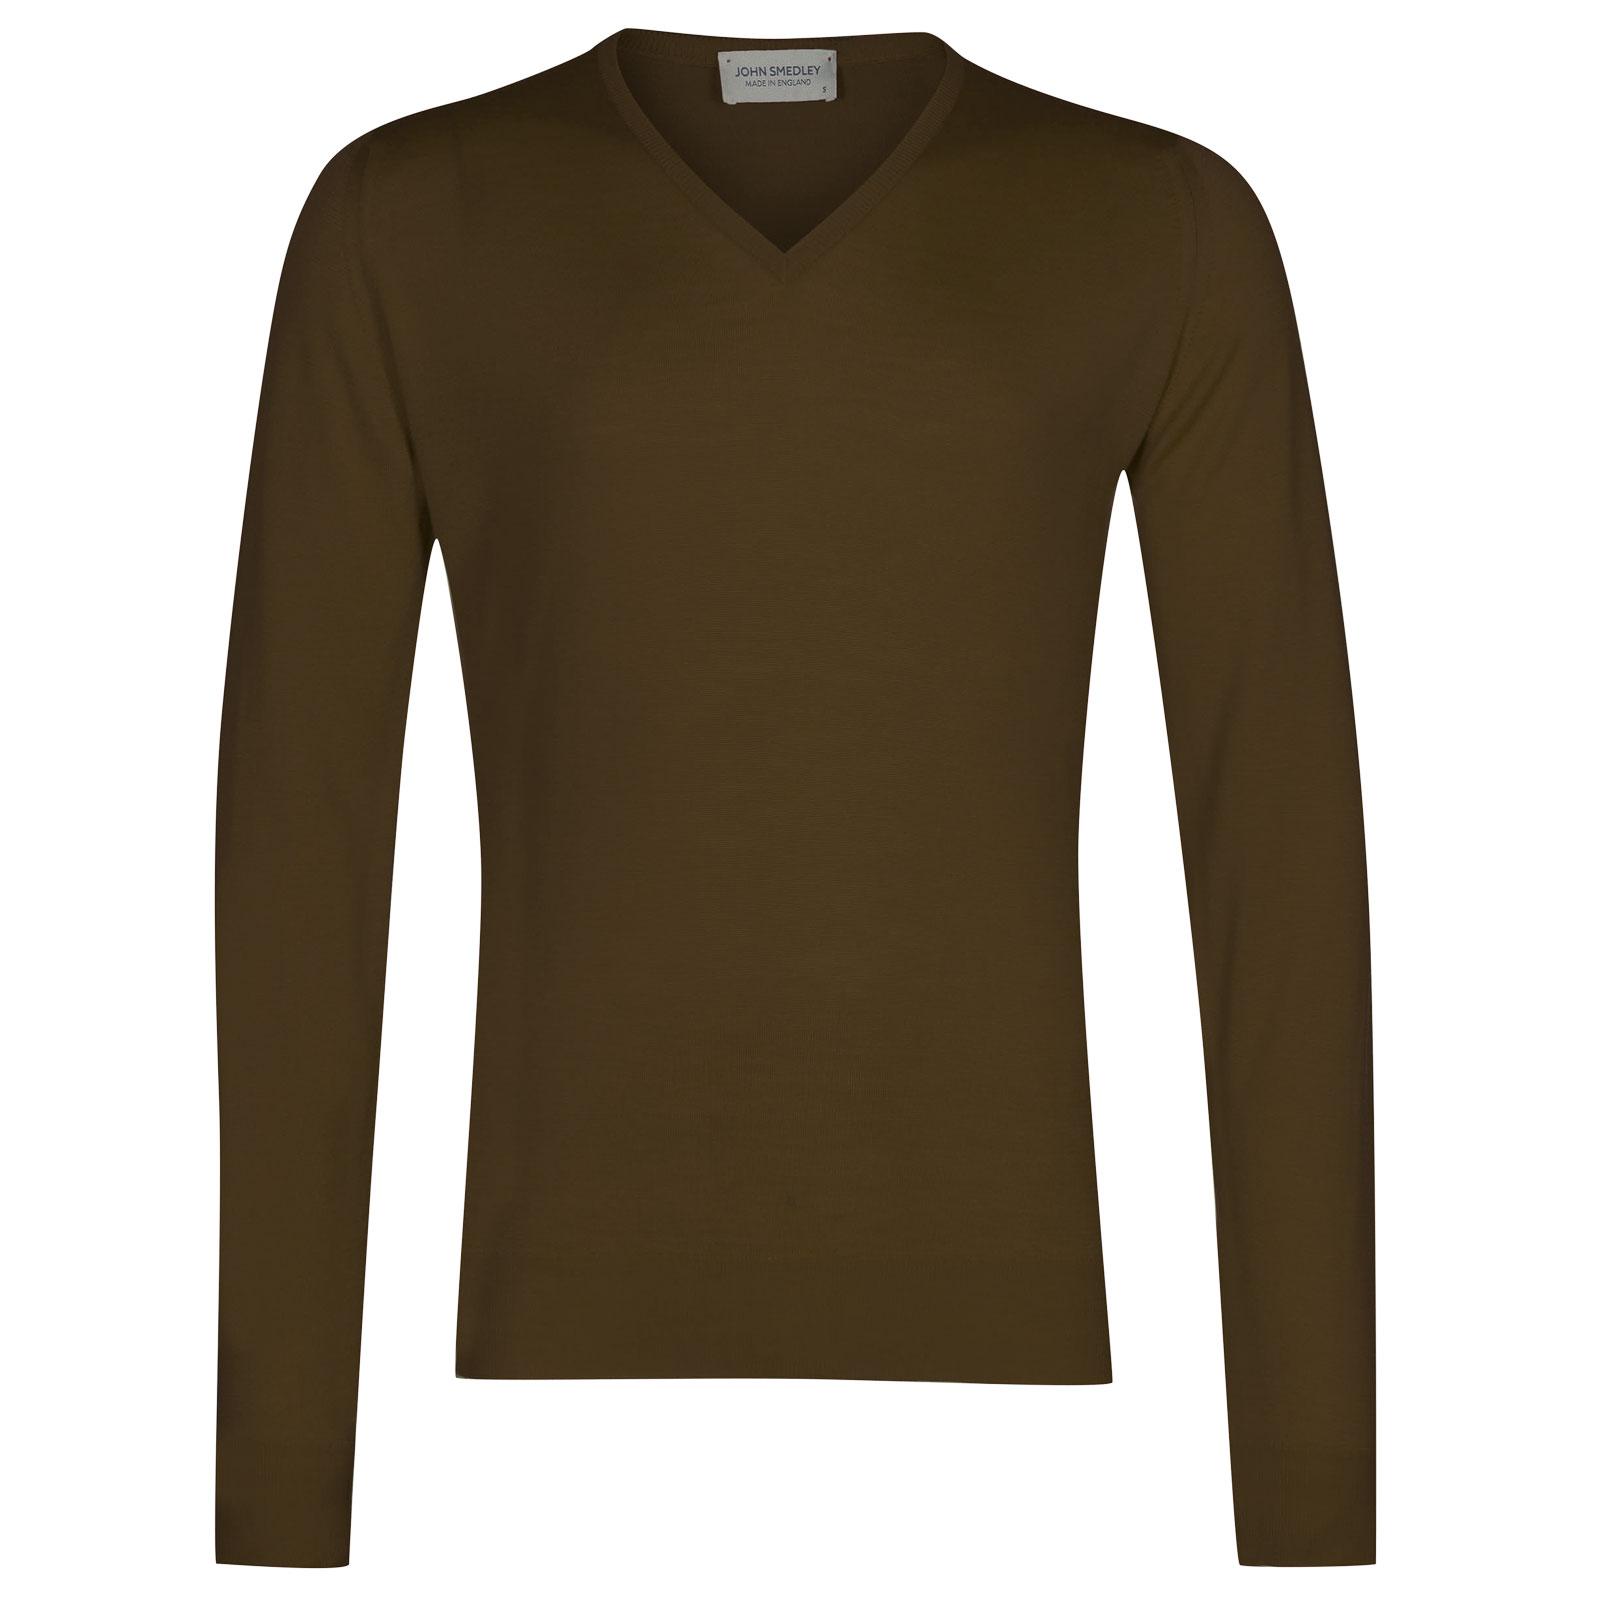 John Smedley Blenheim Merino Wool Pullover in Kielder Green-M